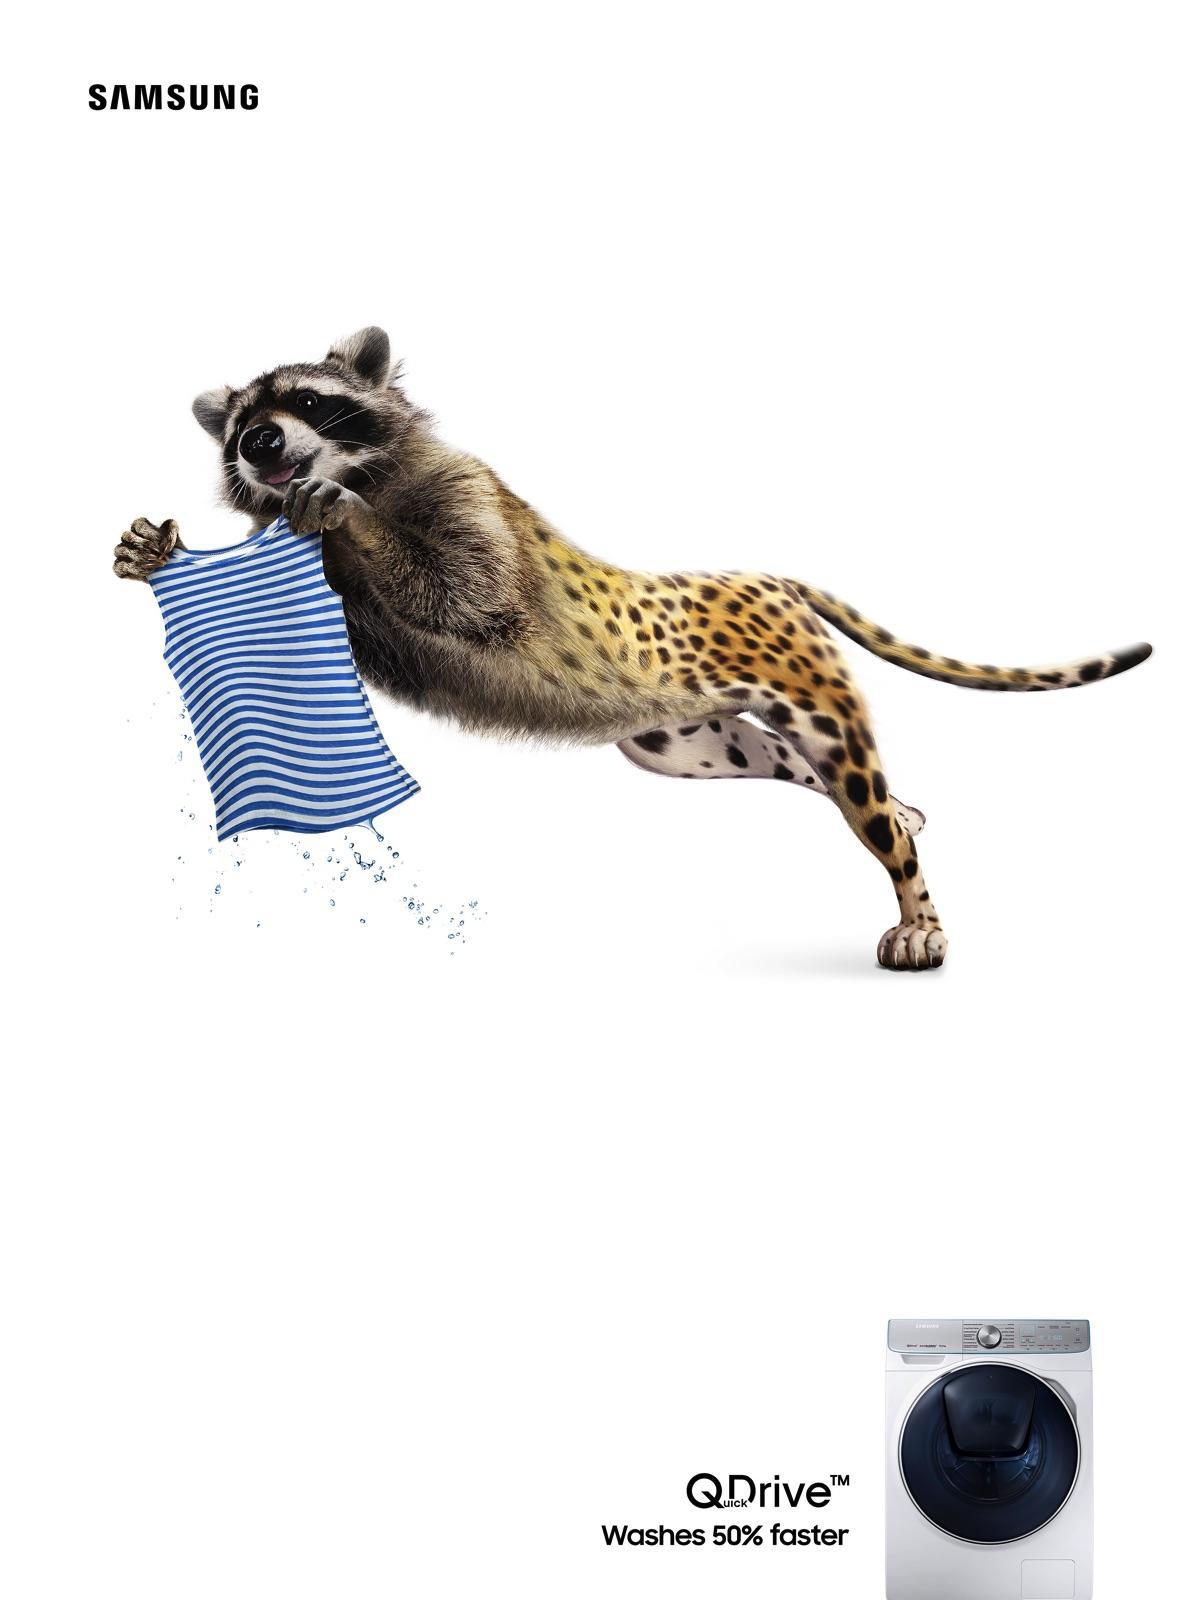 Samsung Print Ad - Raccoon/Cheetah